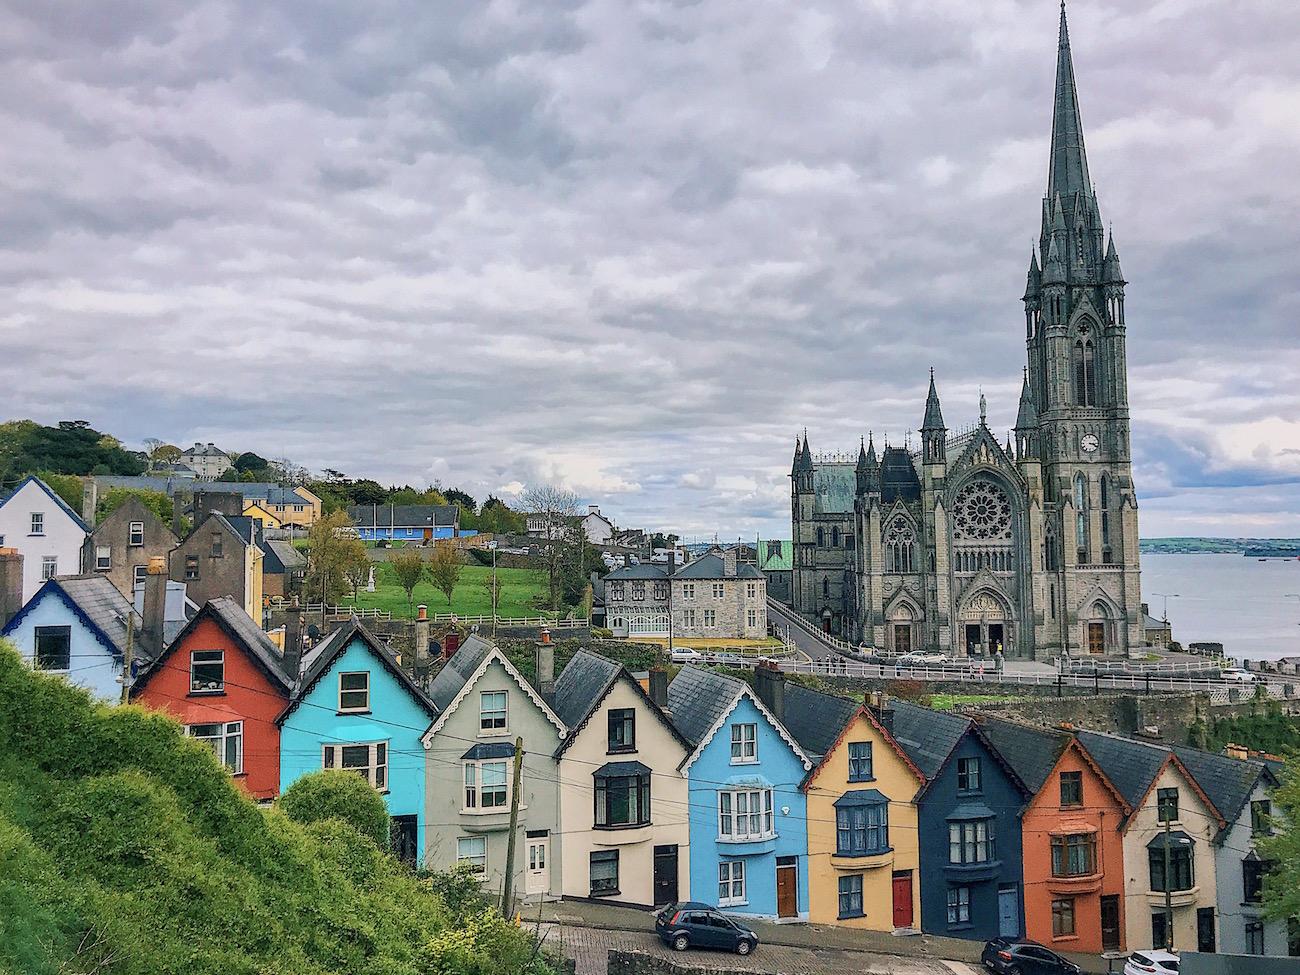 redhead-round-the-world-blogger-ireland-destinations-cobh-church-houses-colours.JPG